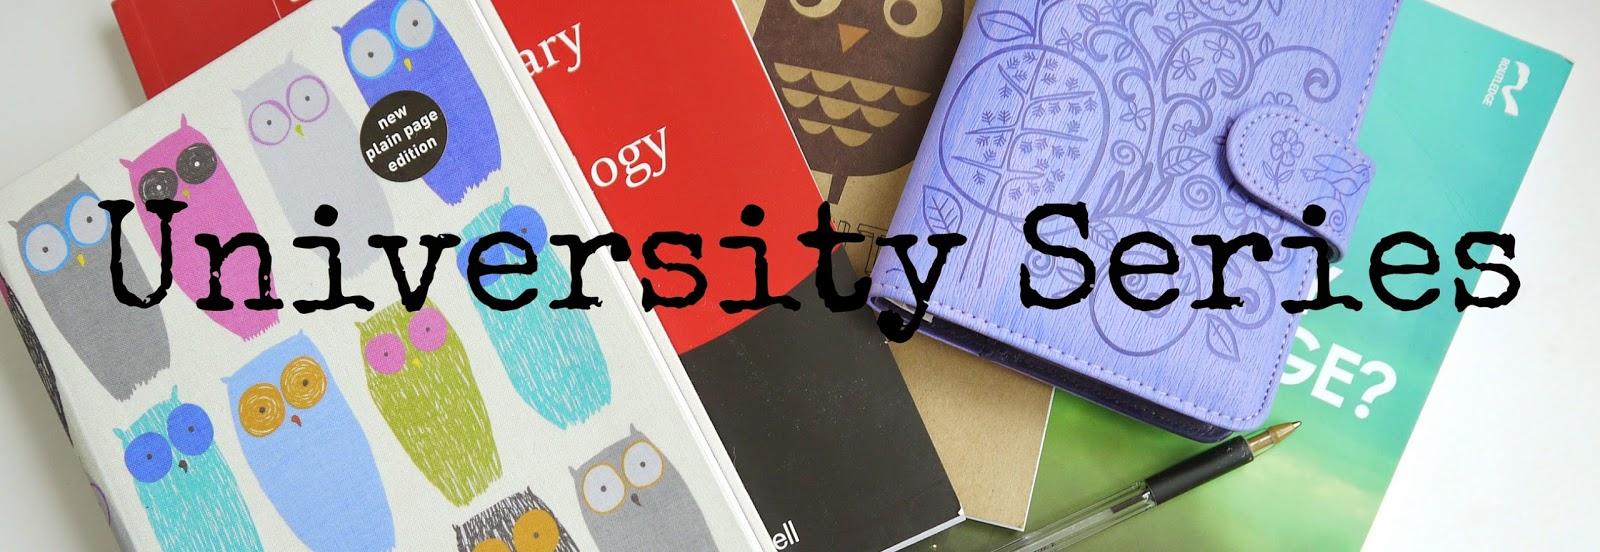 University blog series